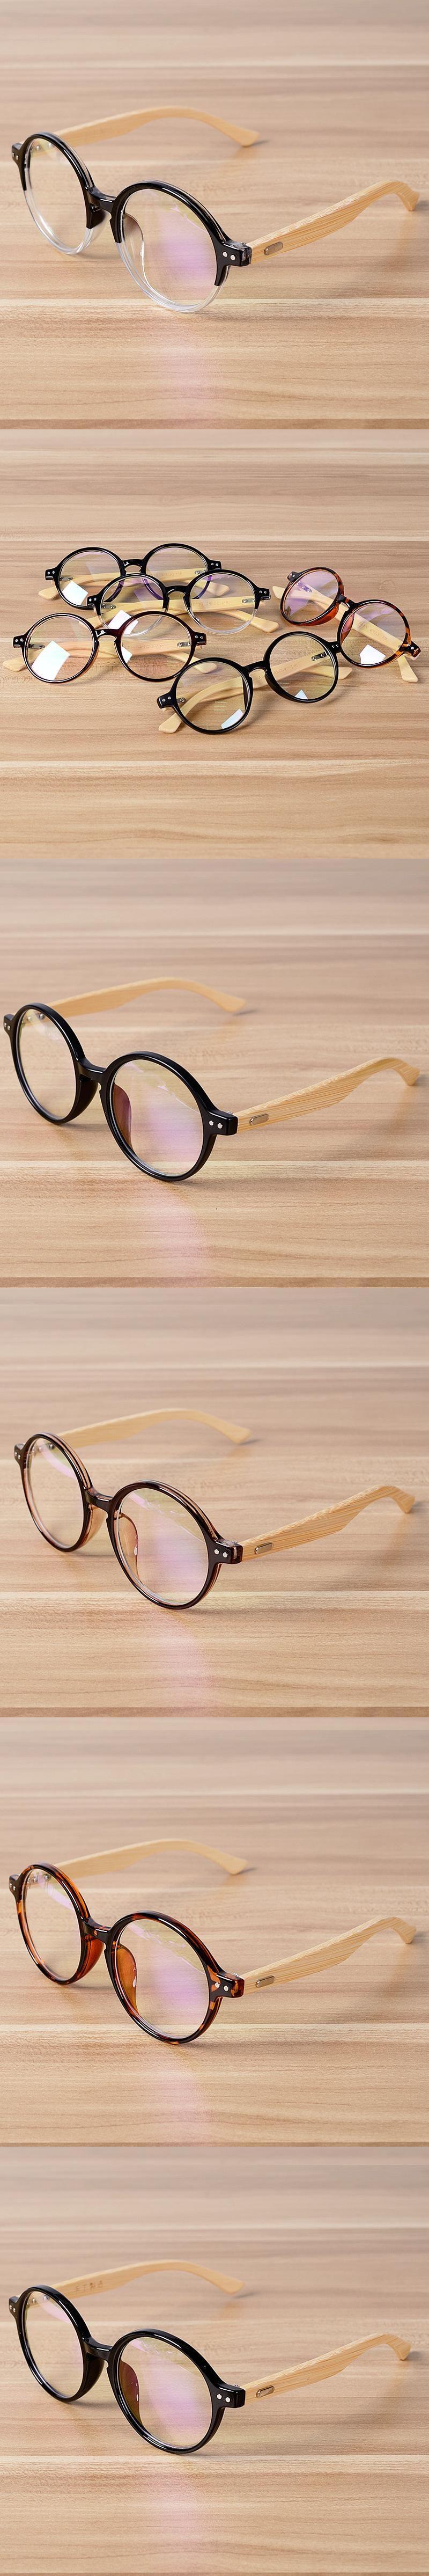 b881403d091 Round Glasses Frame Clear Lens Optical Frames Vintage Eyeglasses Wooden  Bamboo Brown Leopard Eyewear Frames Spectacle